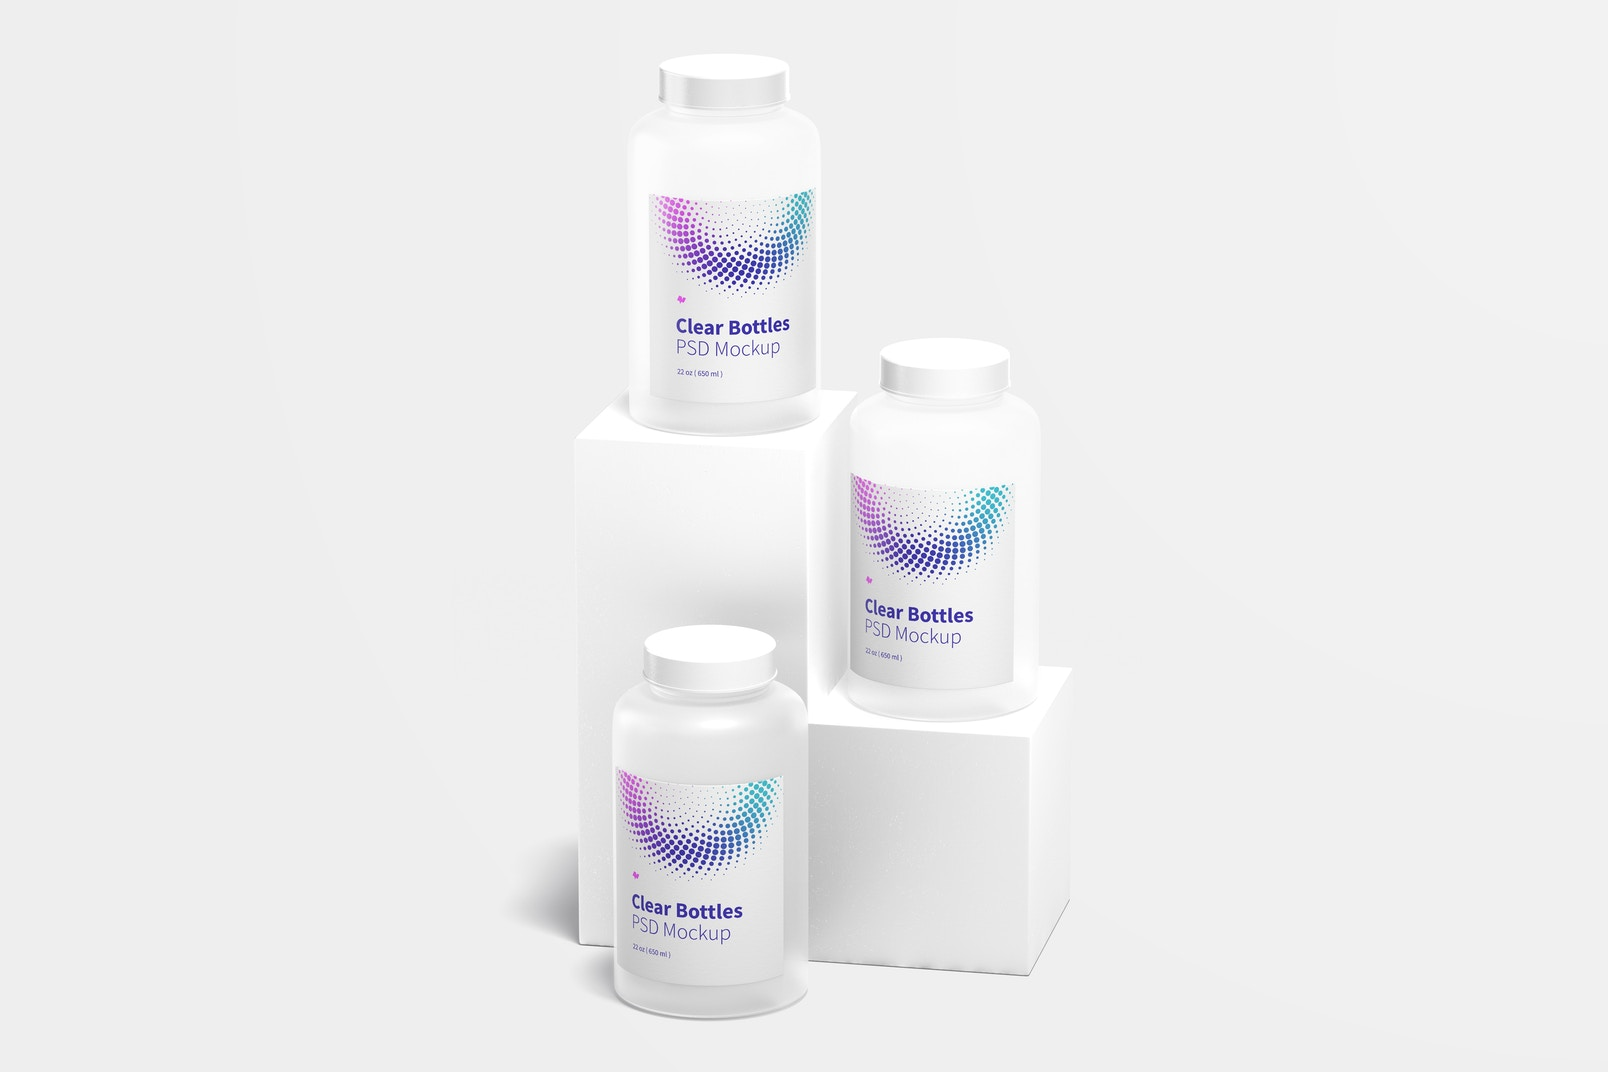 Maqueta de Botellas Transparentes de 22 oz, Vista Frontal